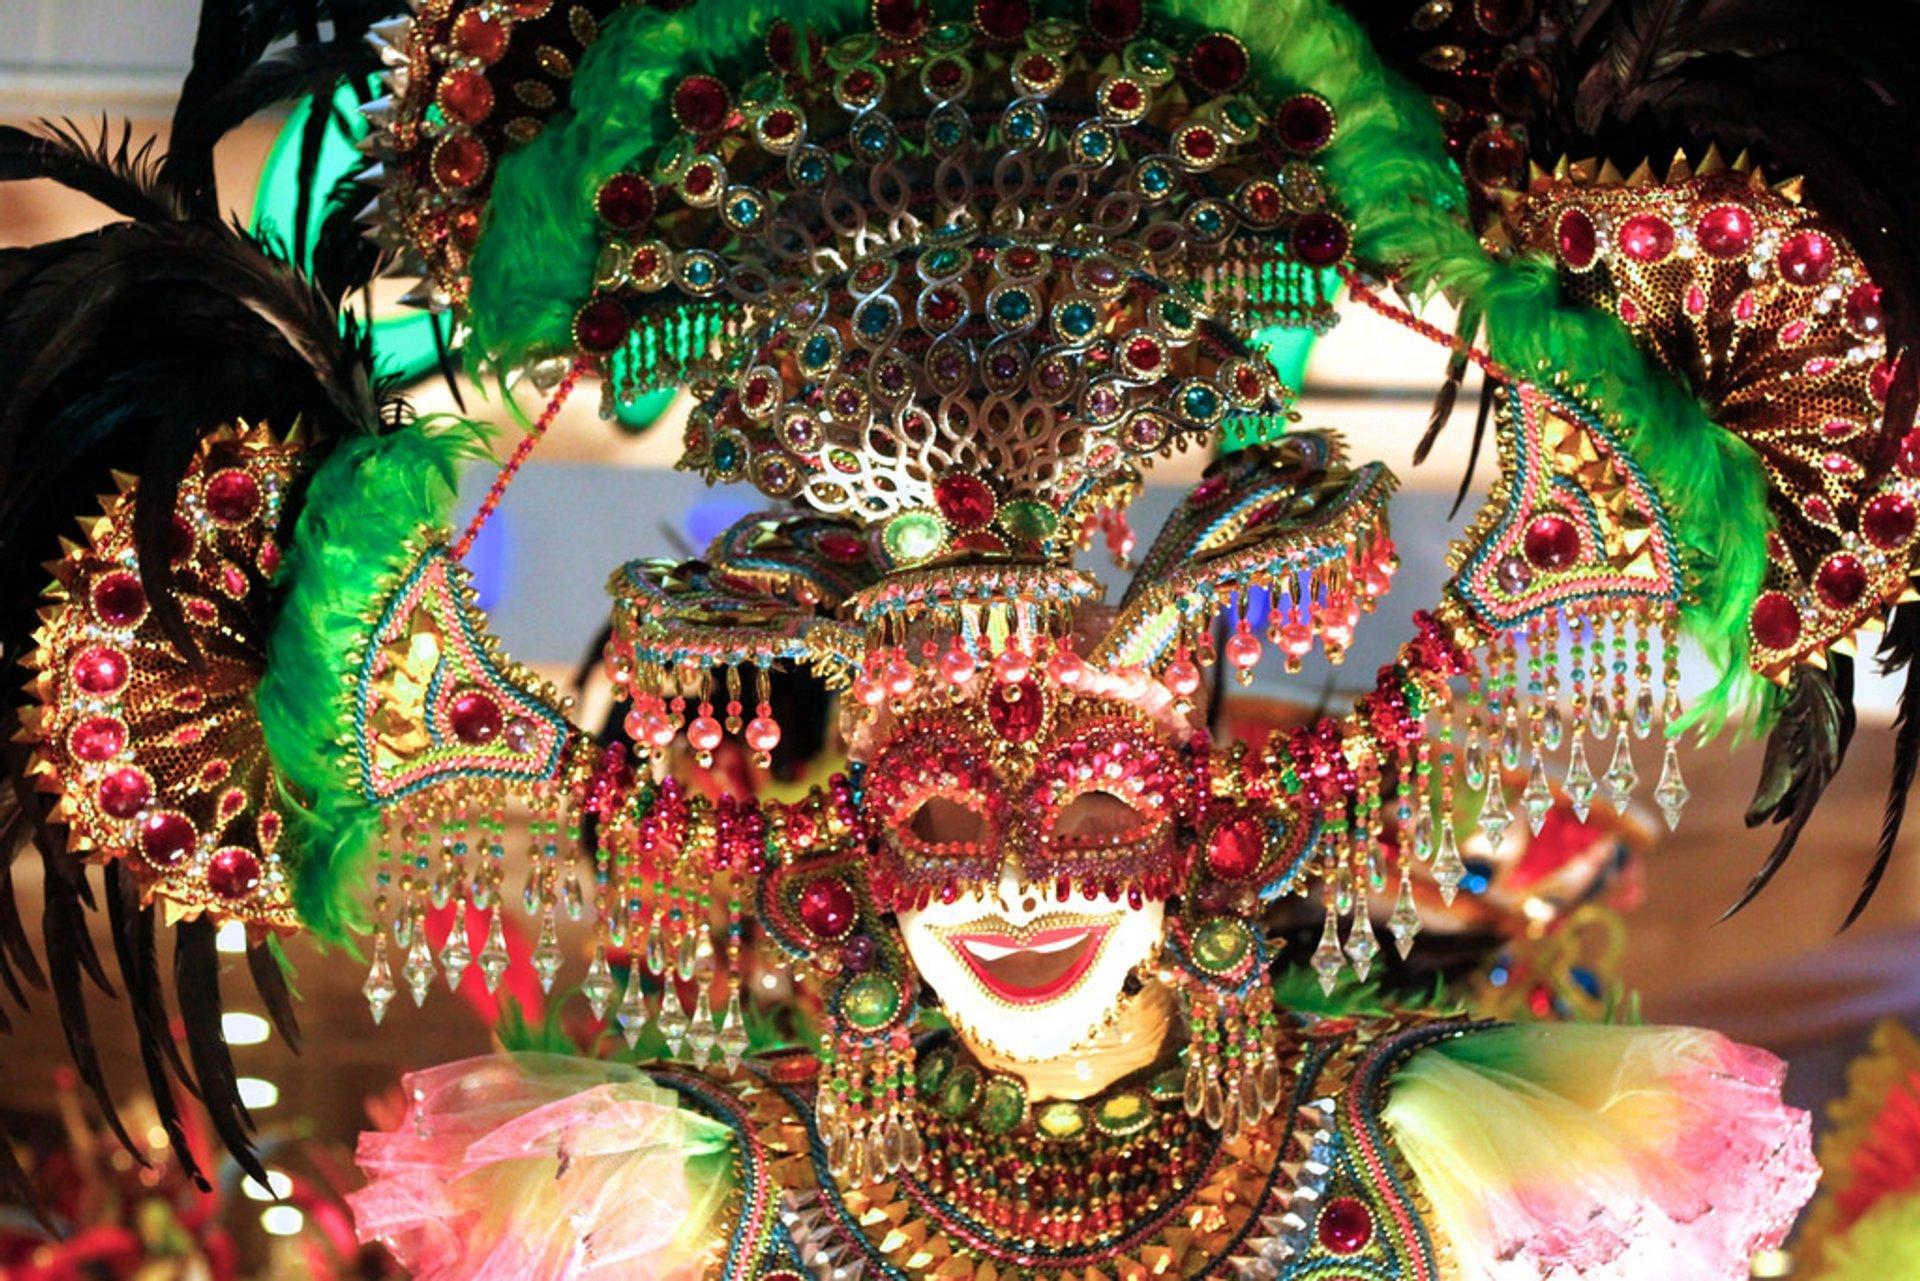 Best time for MassKara Festival in Philippines 2020